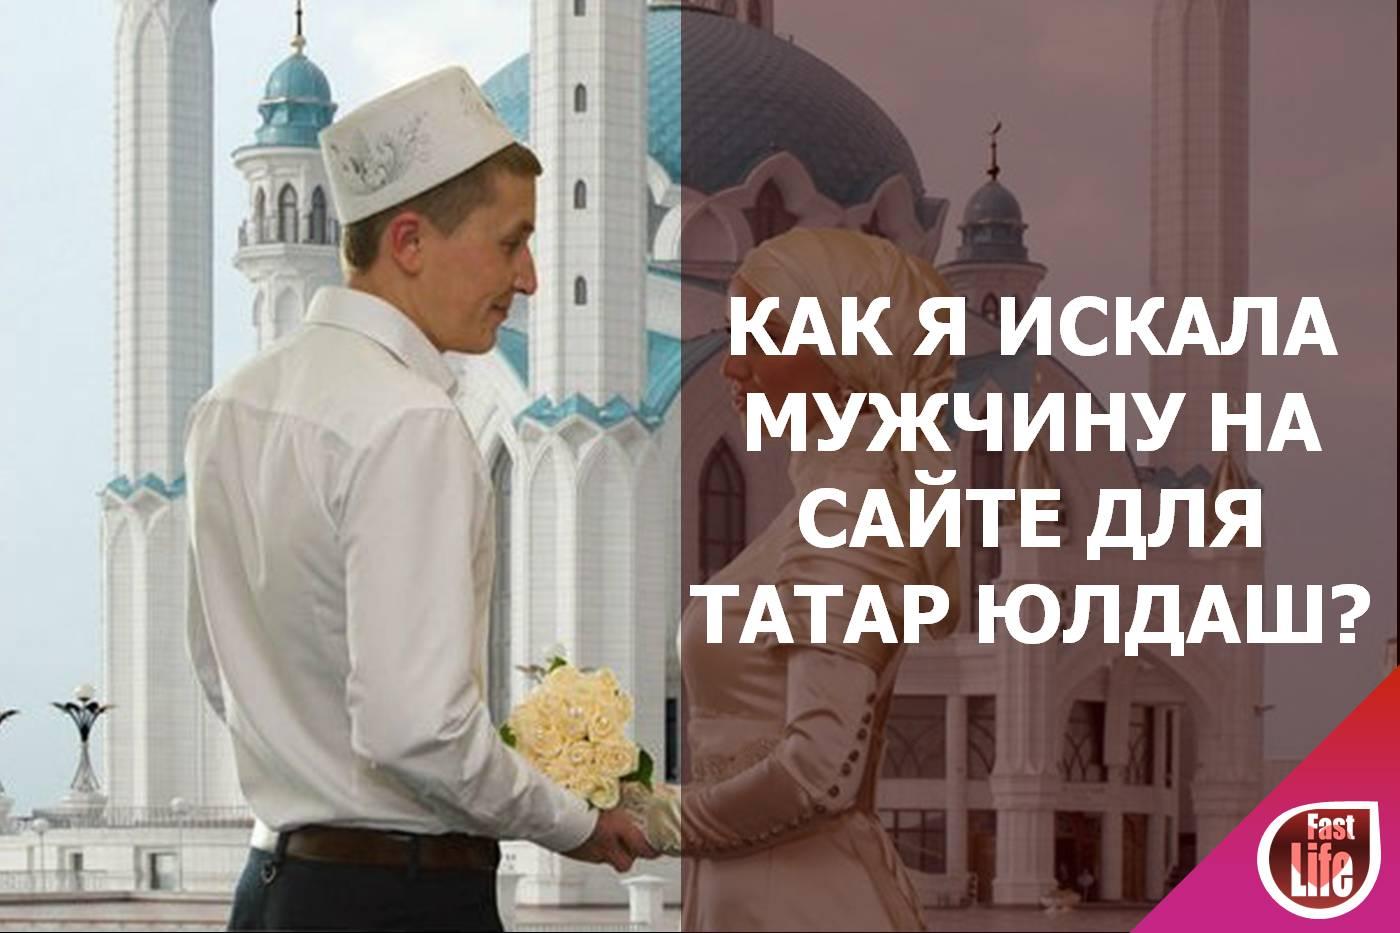 лучший сайт знакомств для татар